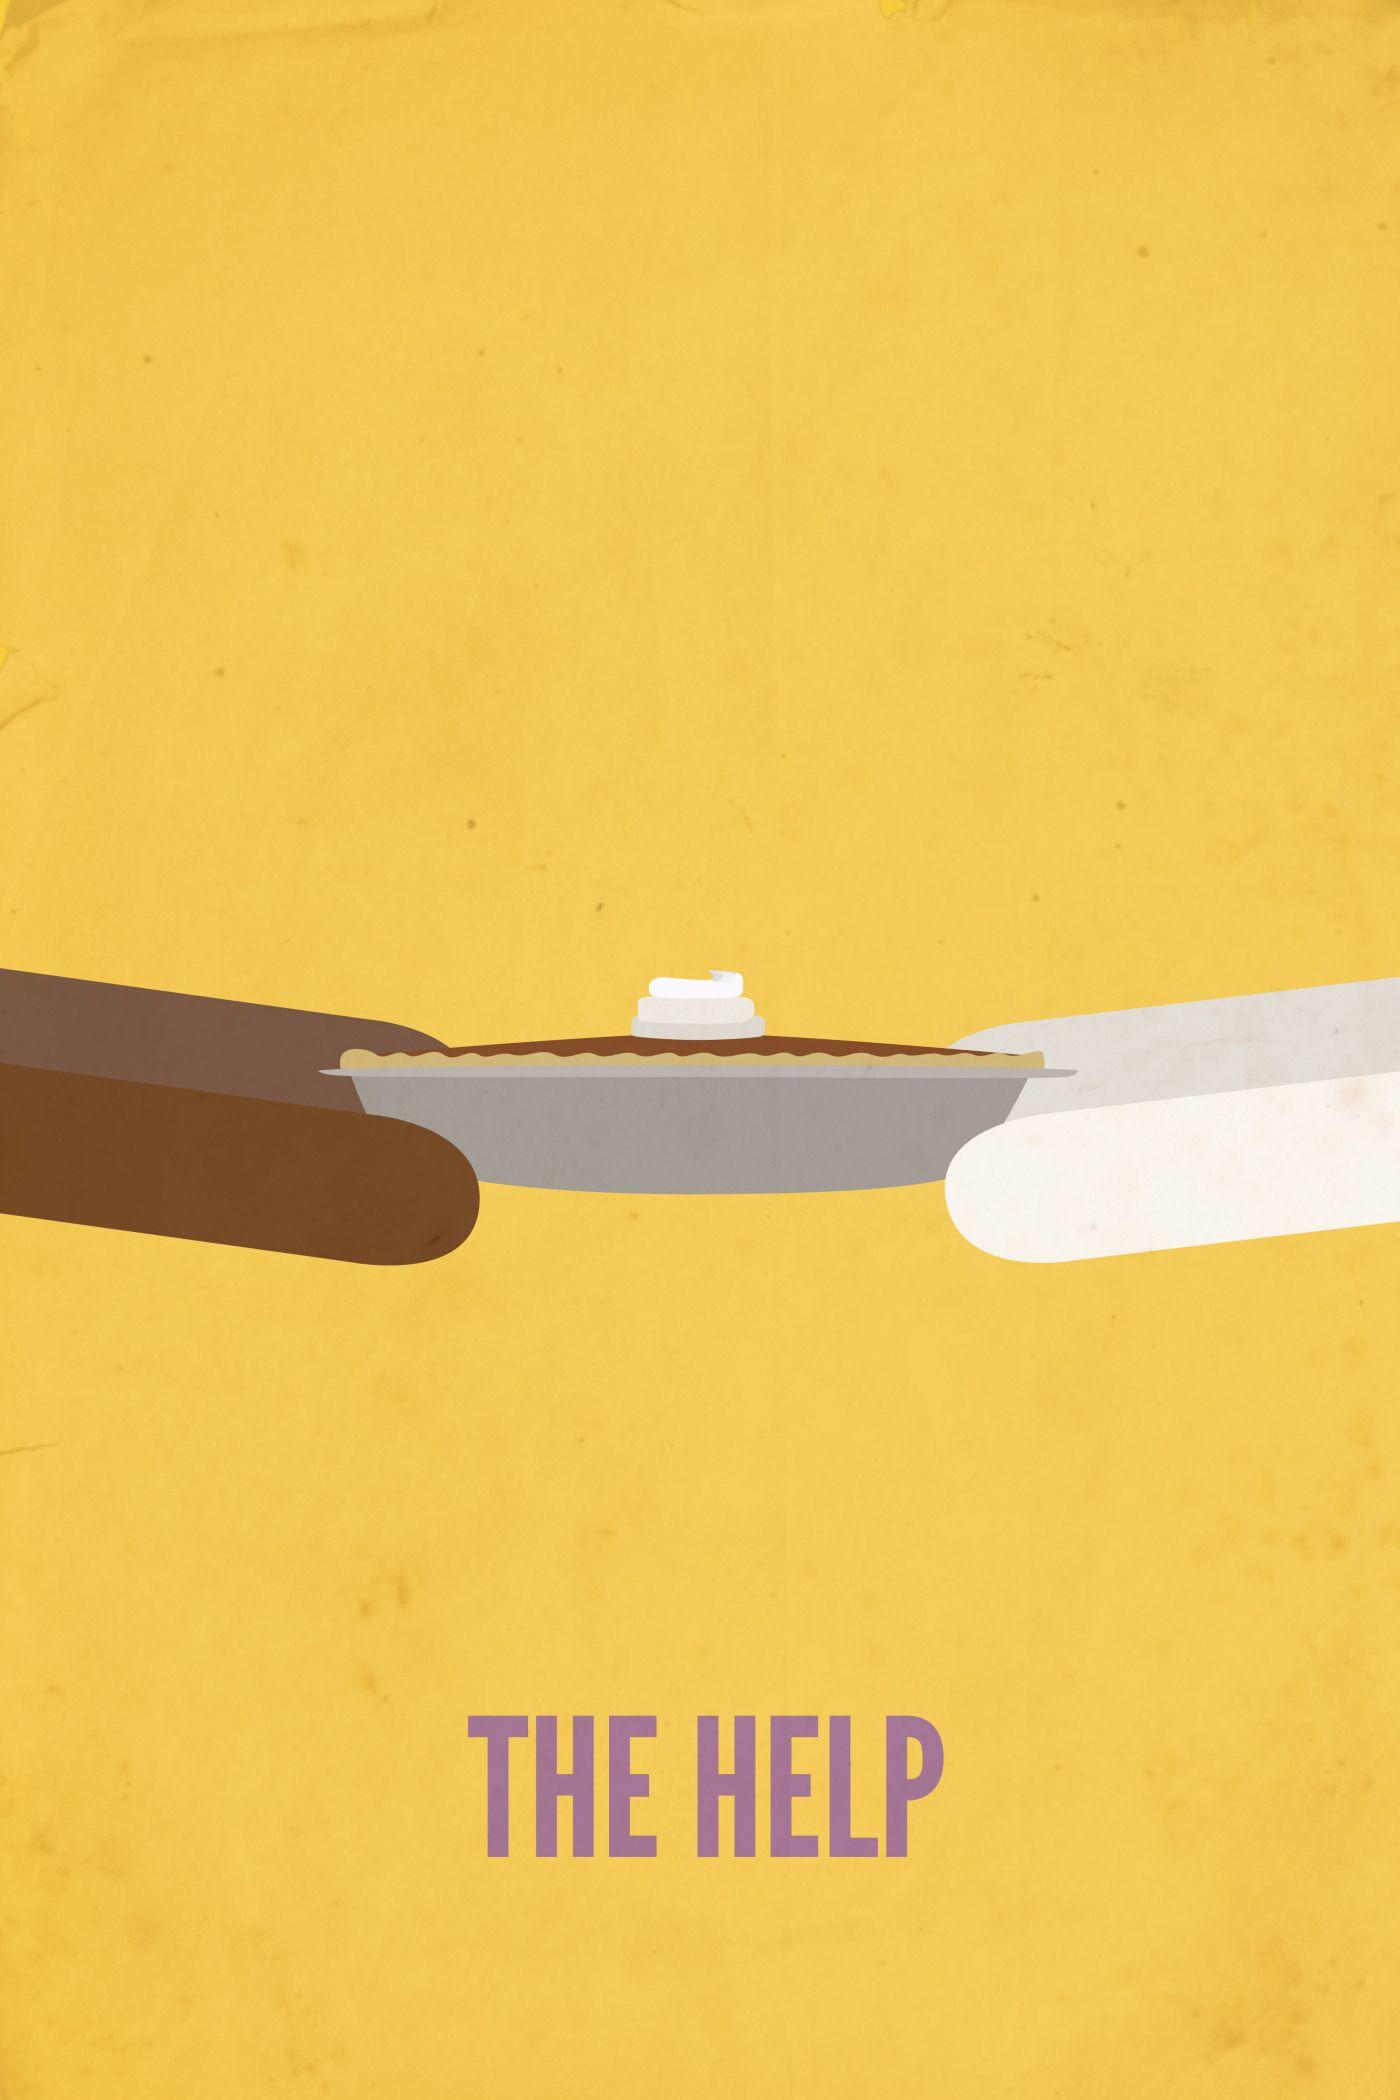 The help minimalist movie poster design graphic design via rebekahjm com